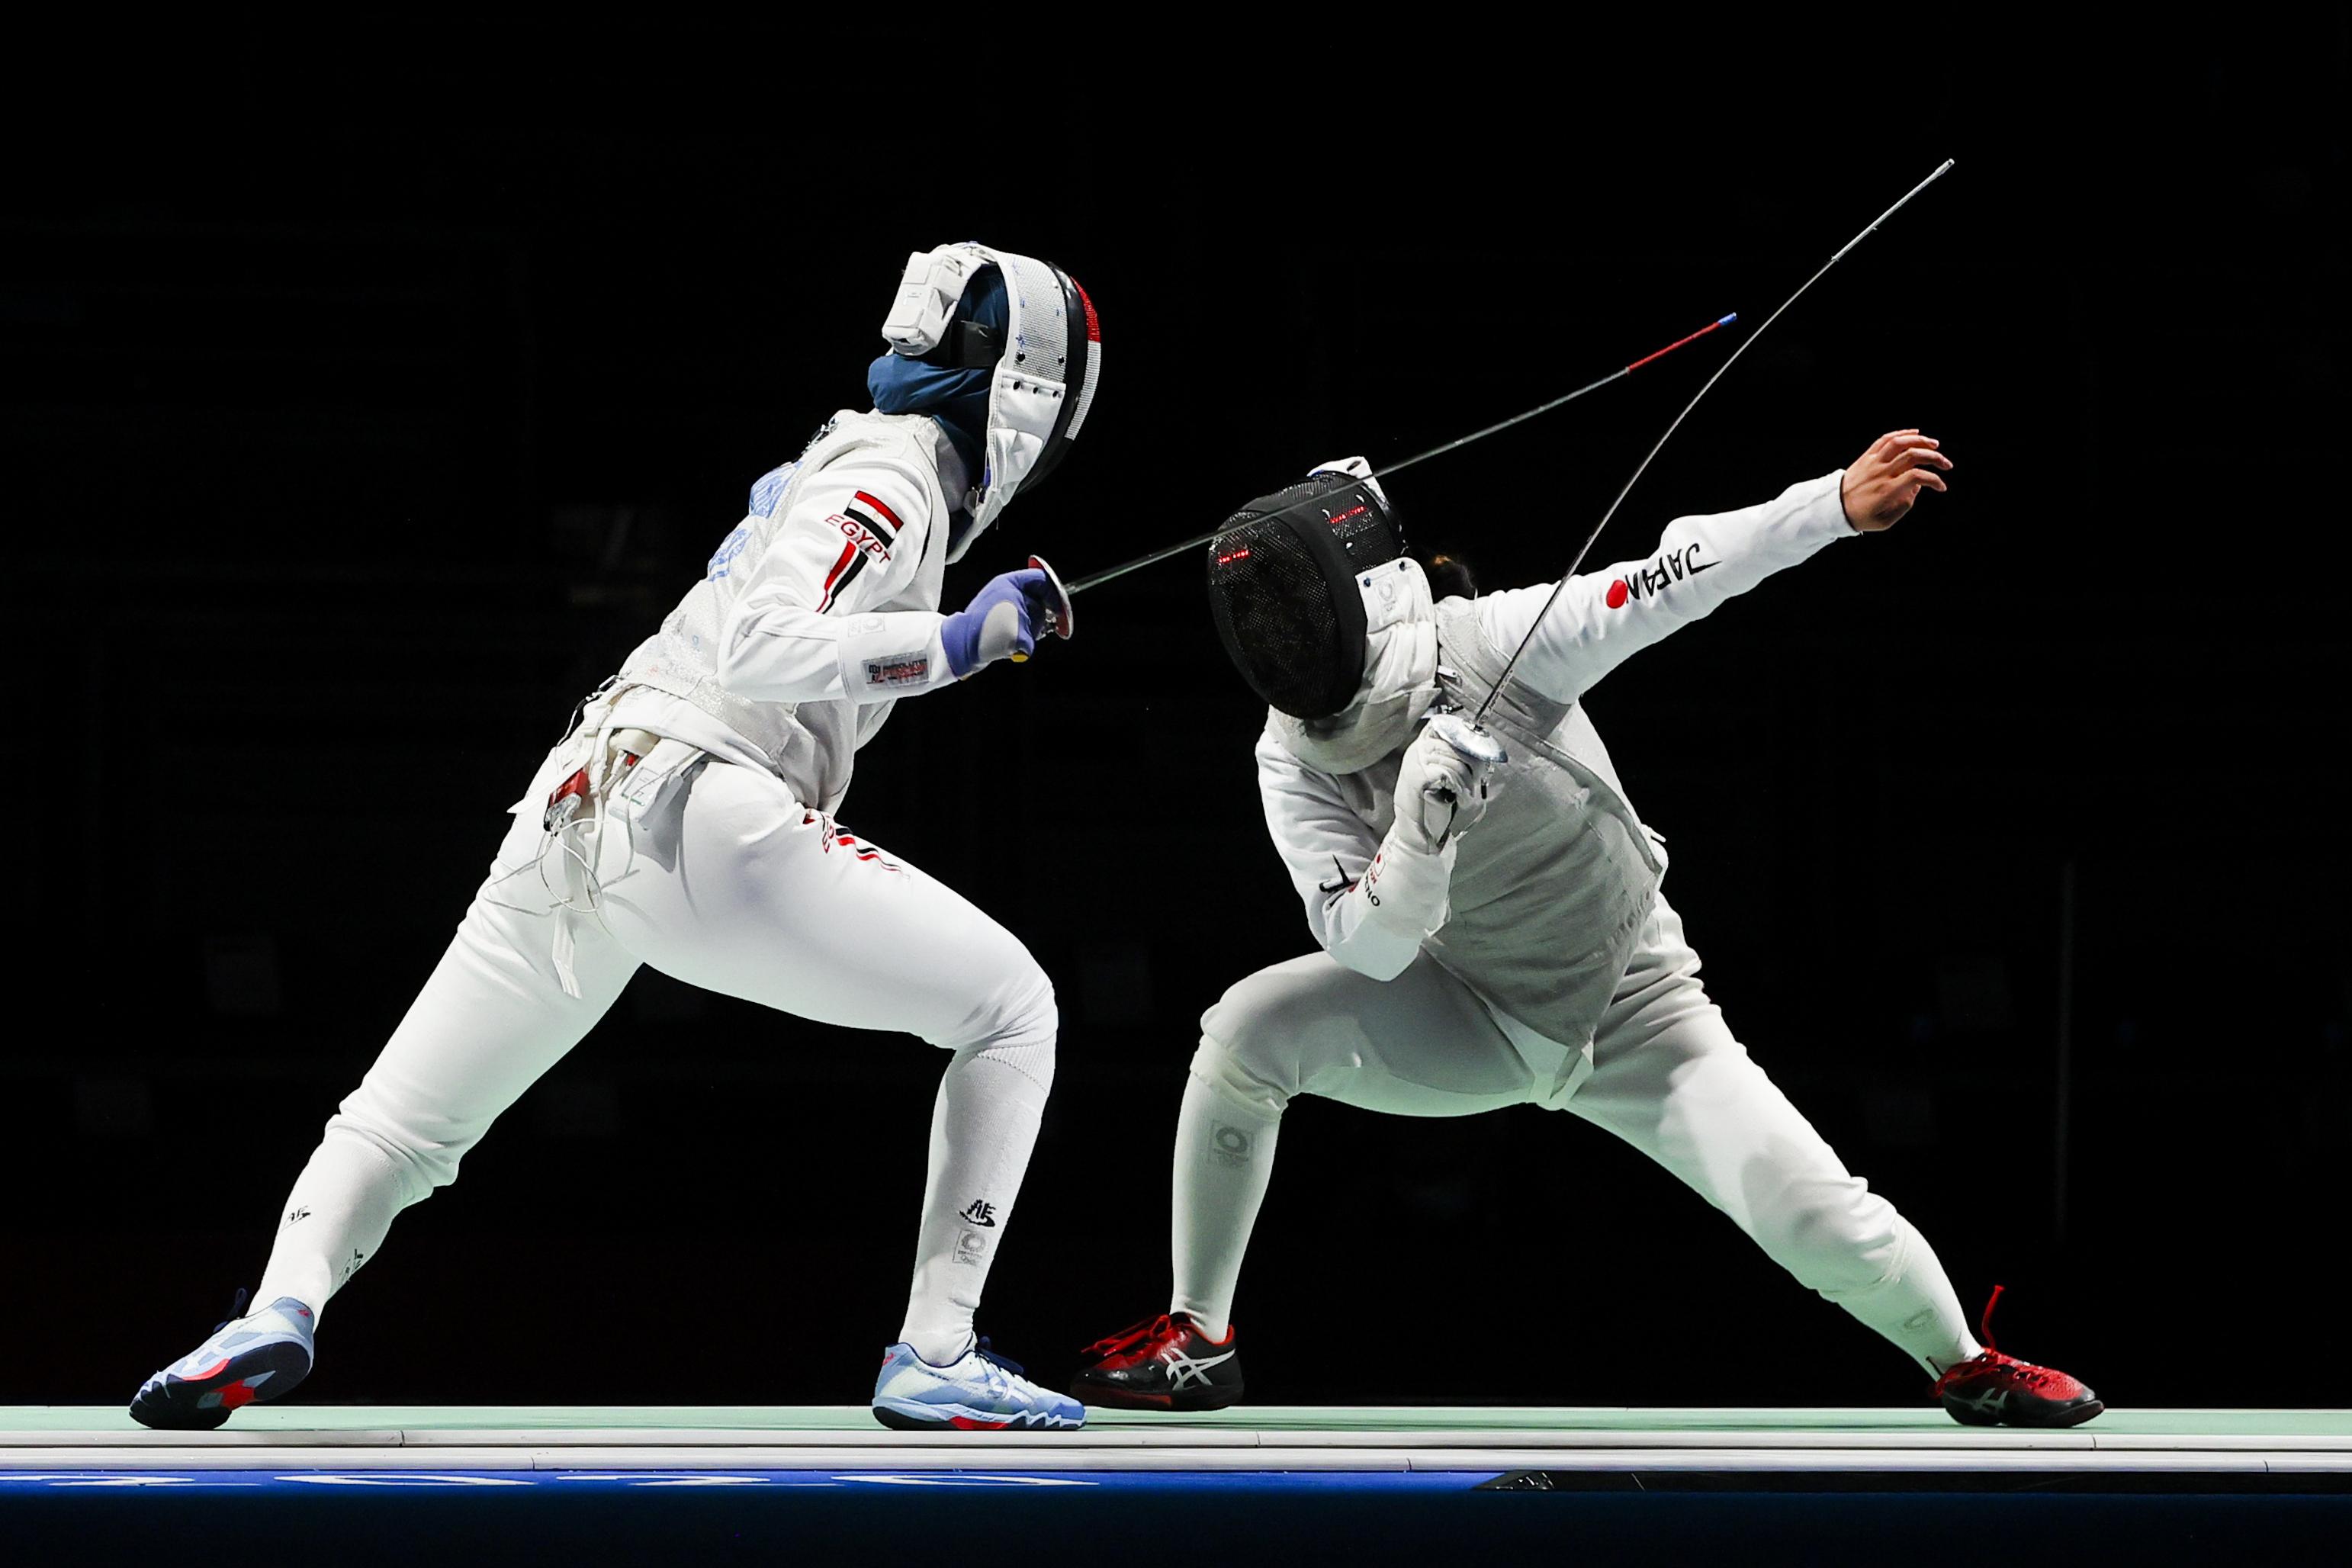 Tokyo 2020 Olympics - Fencing - Women's Individual Foil - Last 32 - Makuhari Messe Hall B - Chiba, Japan - July 25, 2021. Nora Mohamed of Egypt in action against Yuka Ueno of Japan REUTERS/Maxim Shemetov